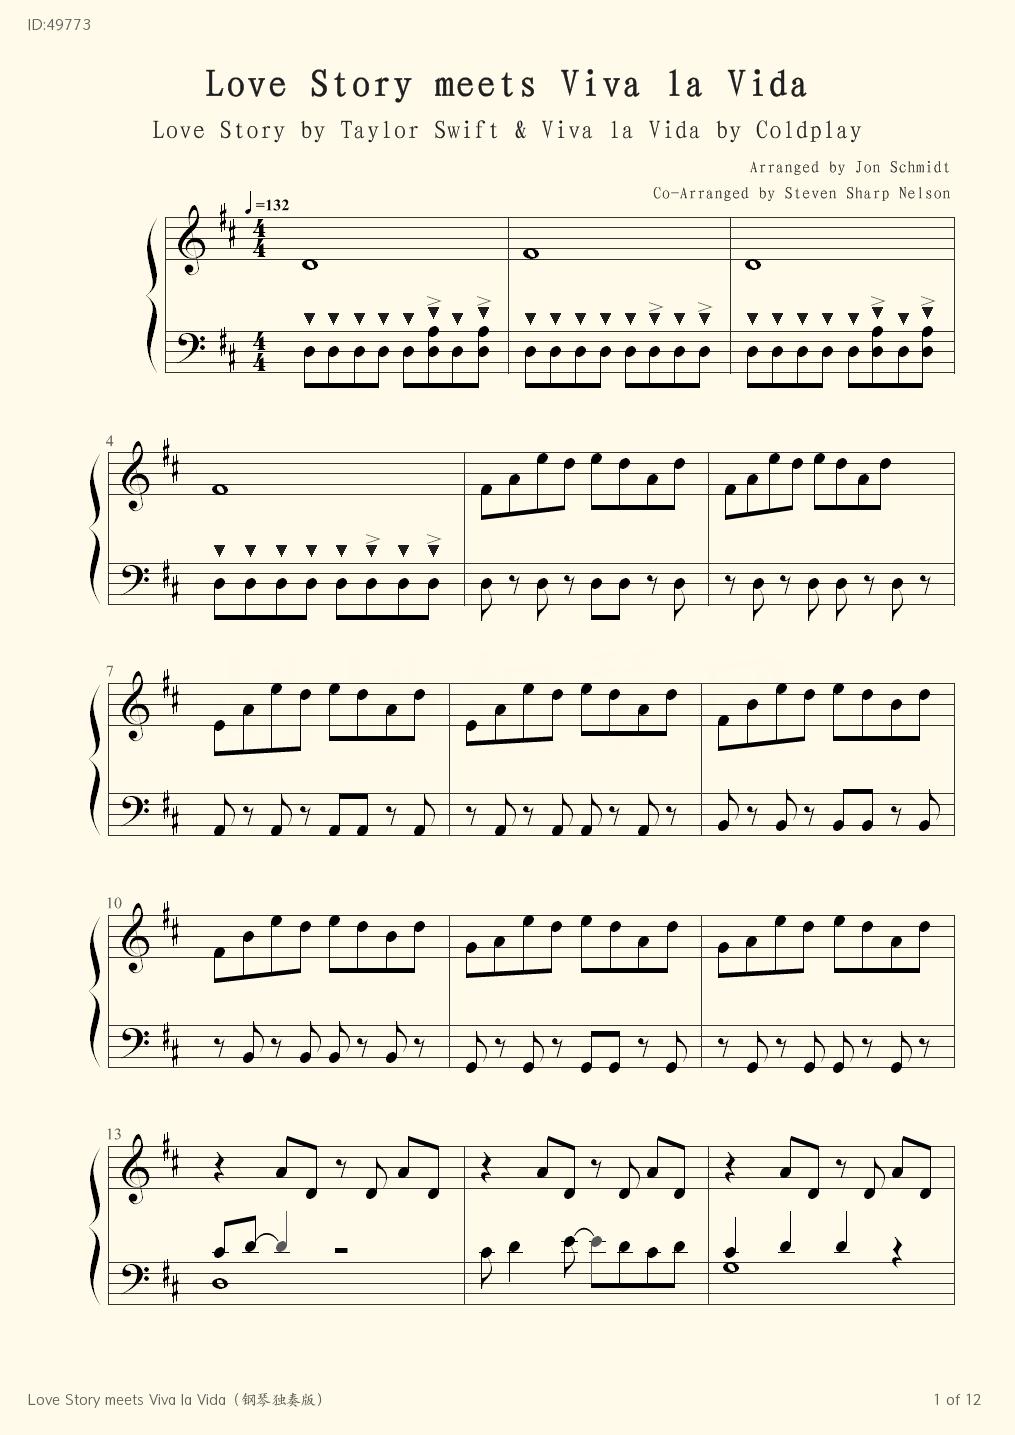 Love Story Meets Viva La Vida Piano Score Jon Schmidt Steven Sharp Nelson Piano Music Fingering Sheet Music Bar